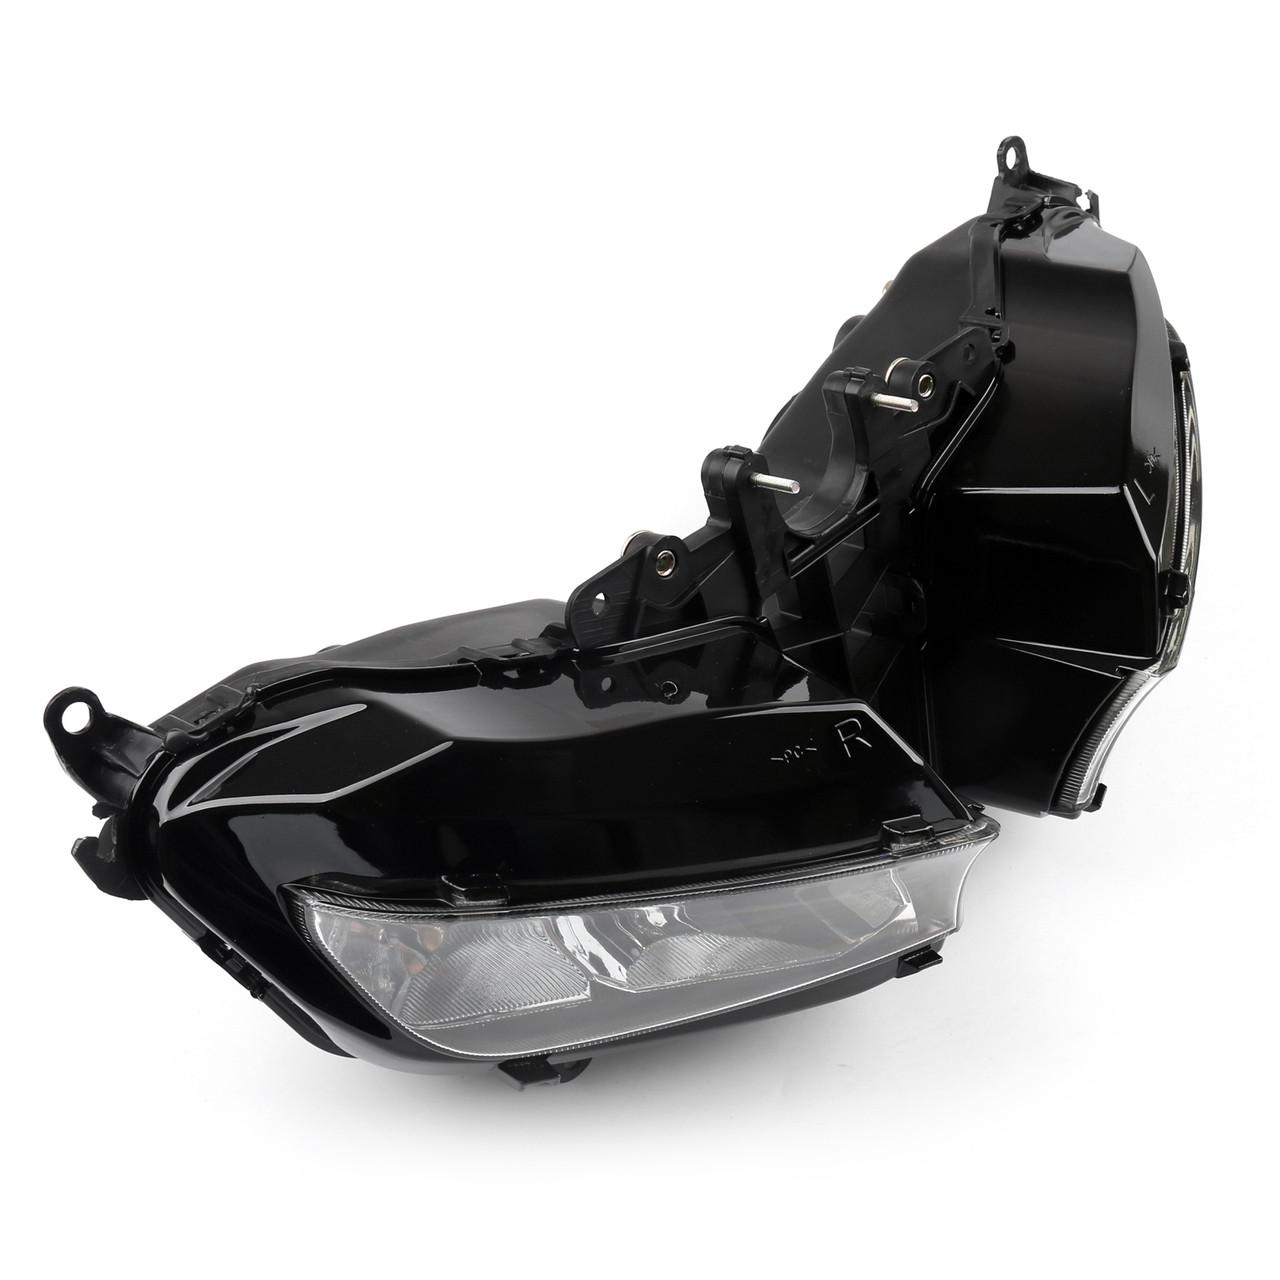 Headlight Assembly Headlamp Honda CBR600RR (2013-2015) Clear